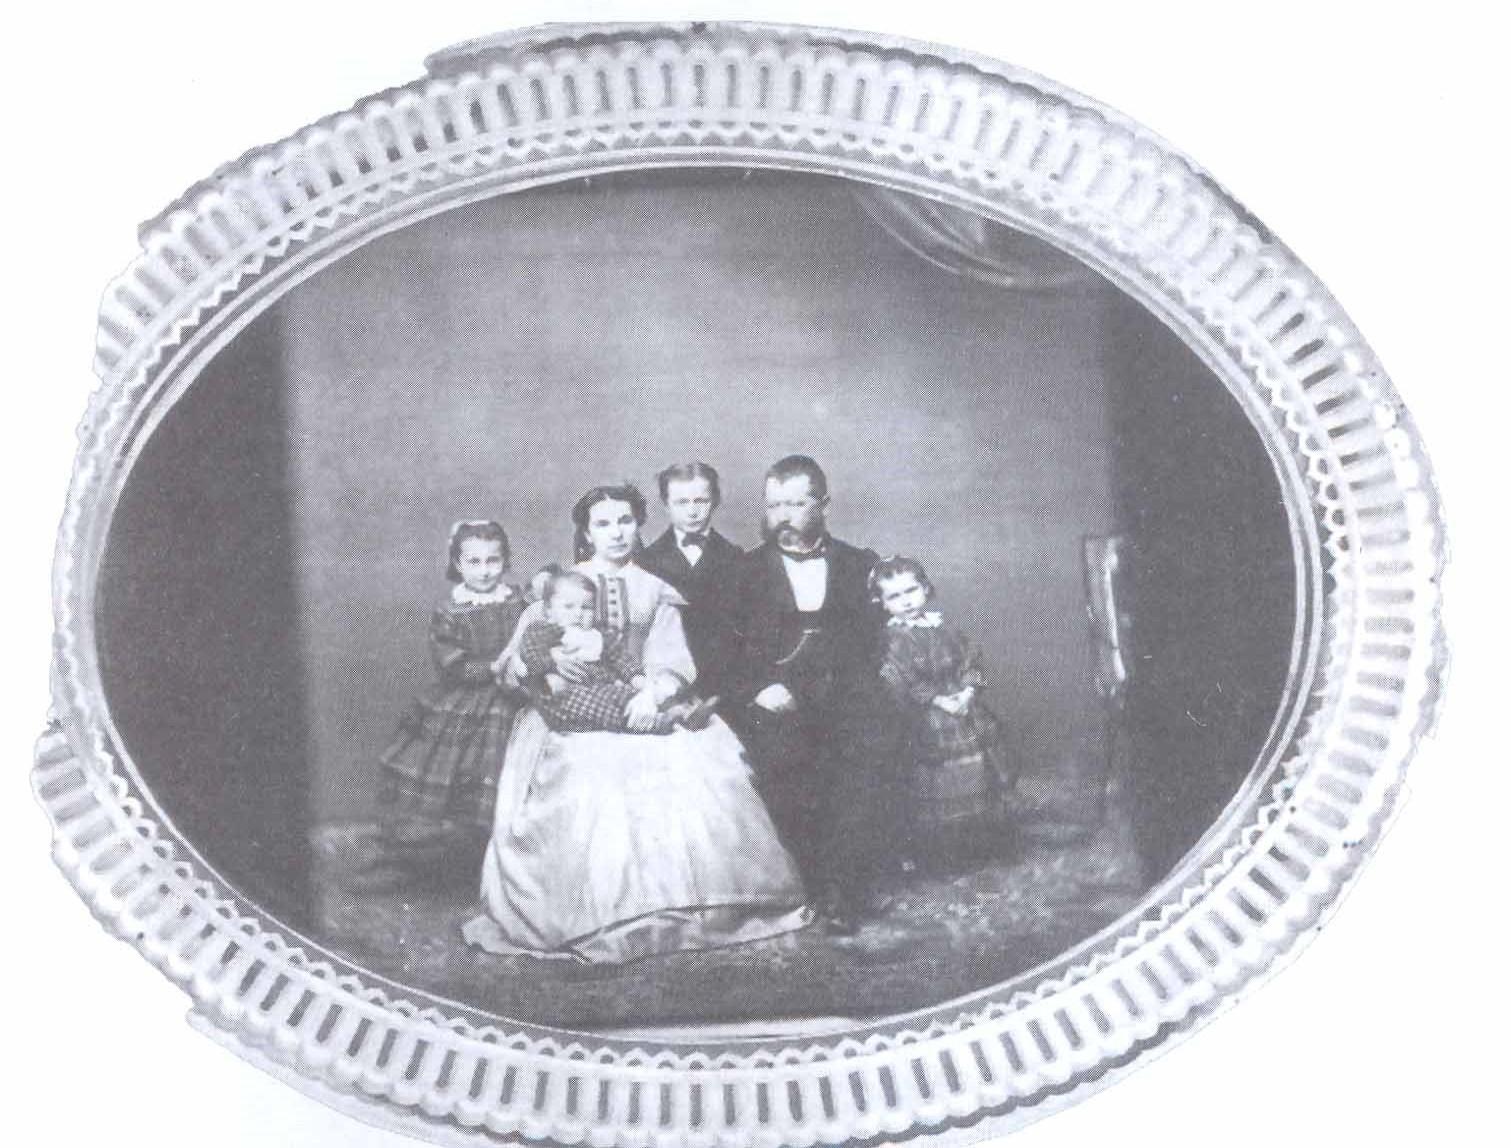 1.Porodica Papokostopulos,  dr Platon kao dete u krilu majke